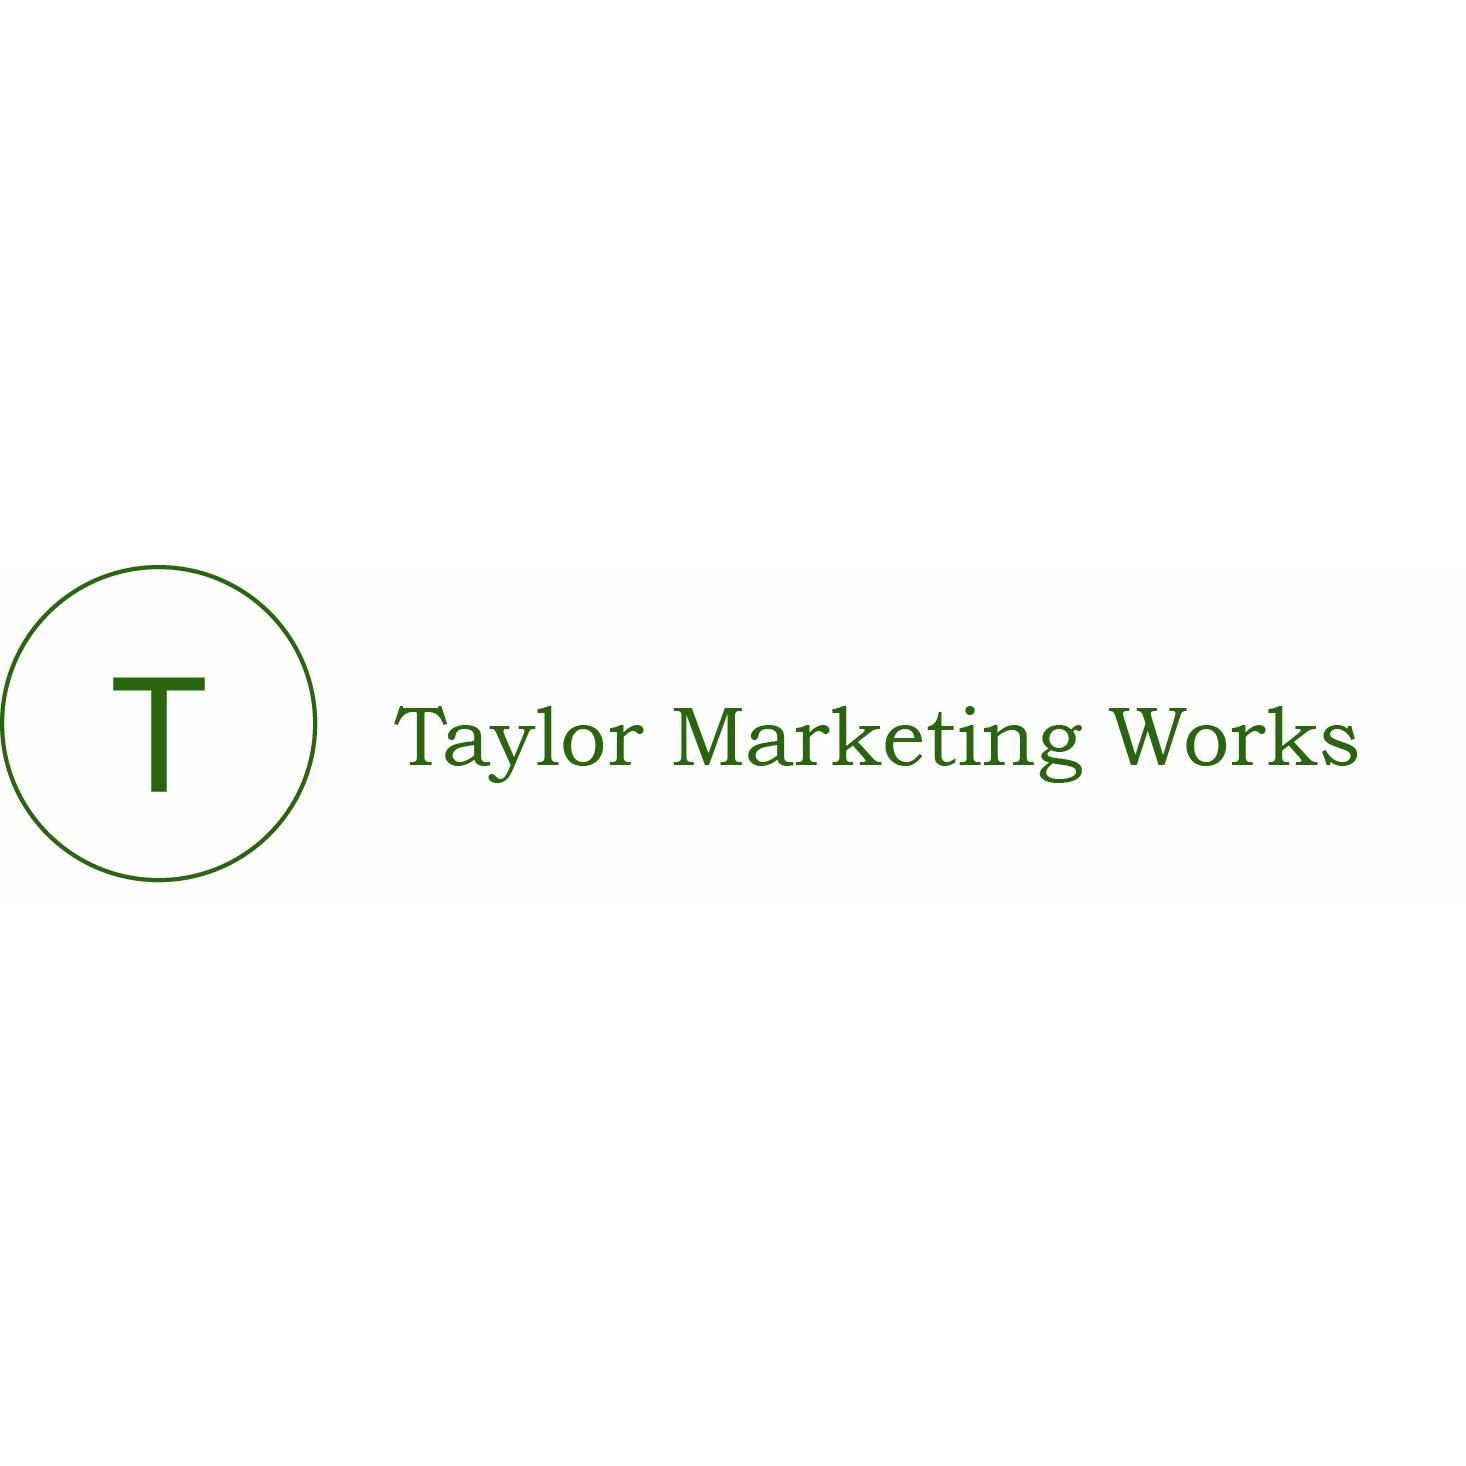 Taylor Marketing Works